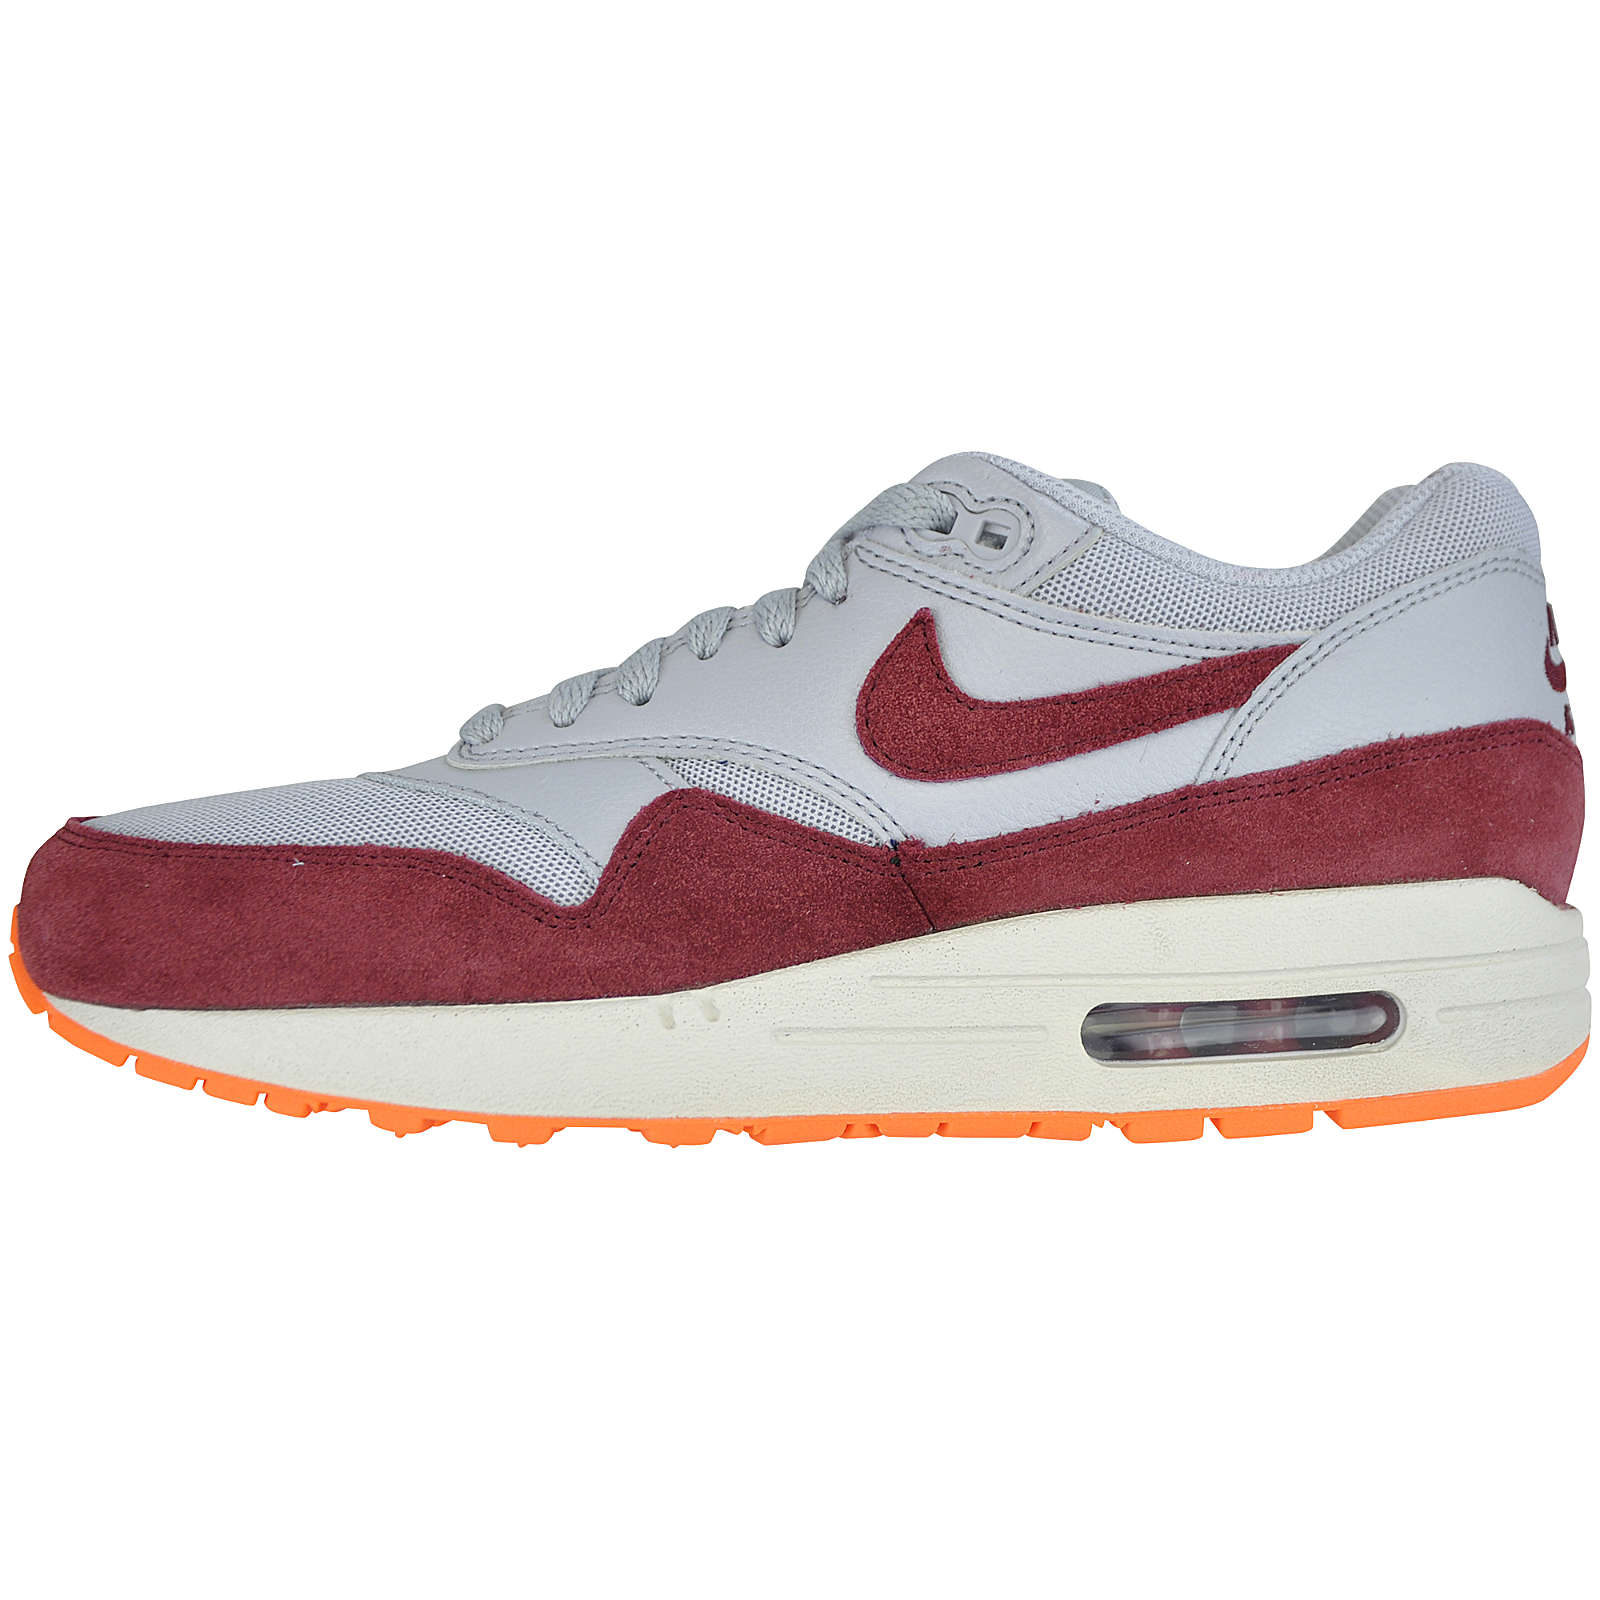 WMNS Nike Air Max 1 Essential 599820-015 Sneakers Low rot/weiß Damen Gr. 37,5